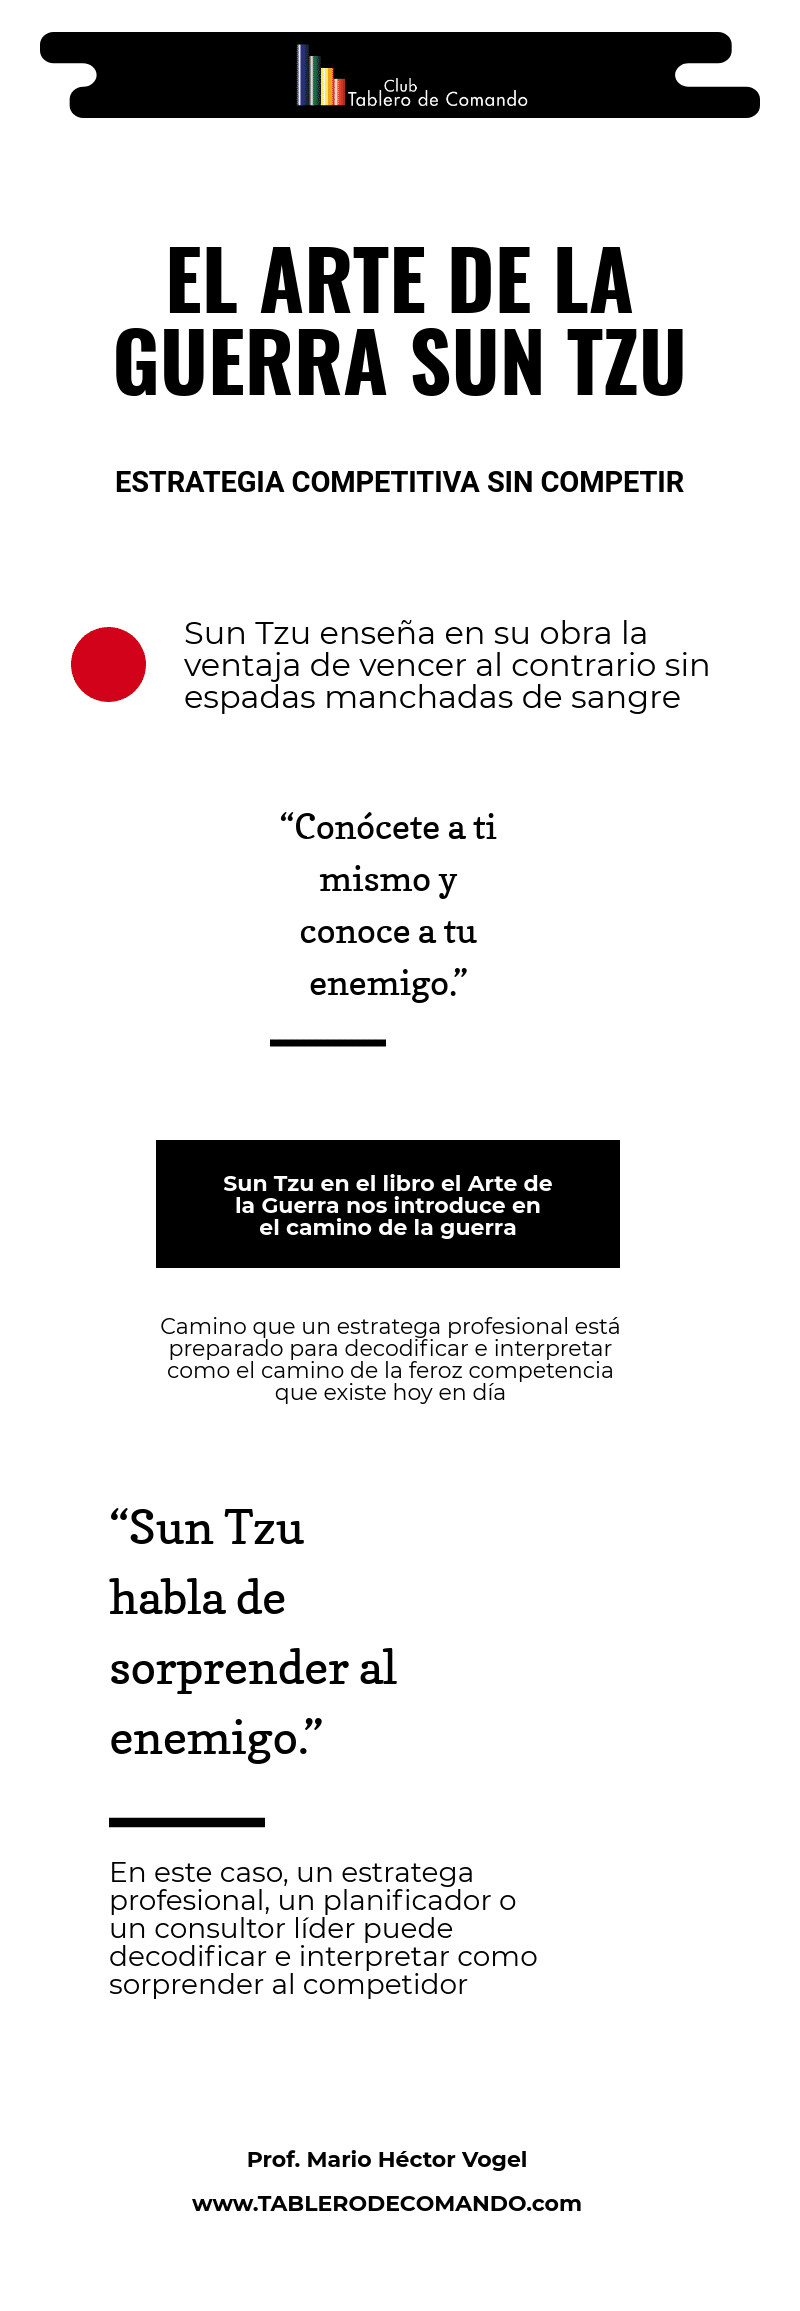 El Arte De La Guerra Sun Tzu Estrategia Competitiva